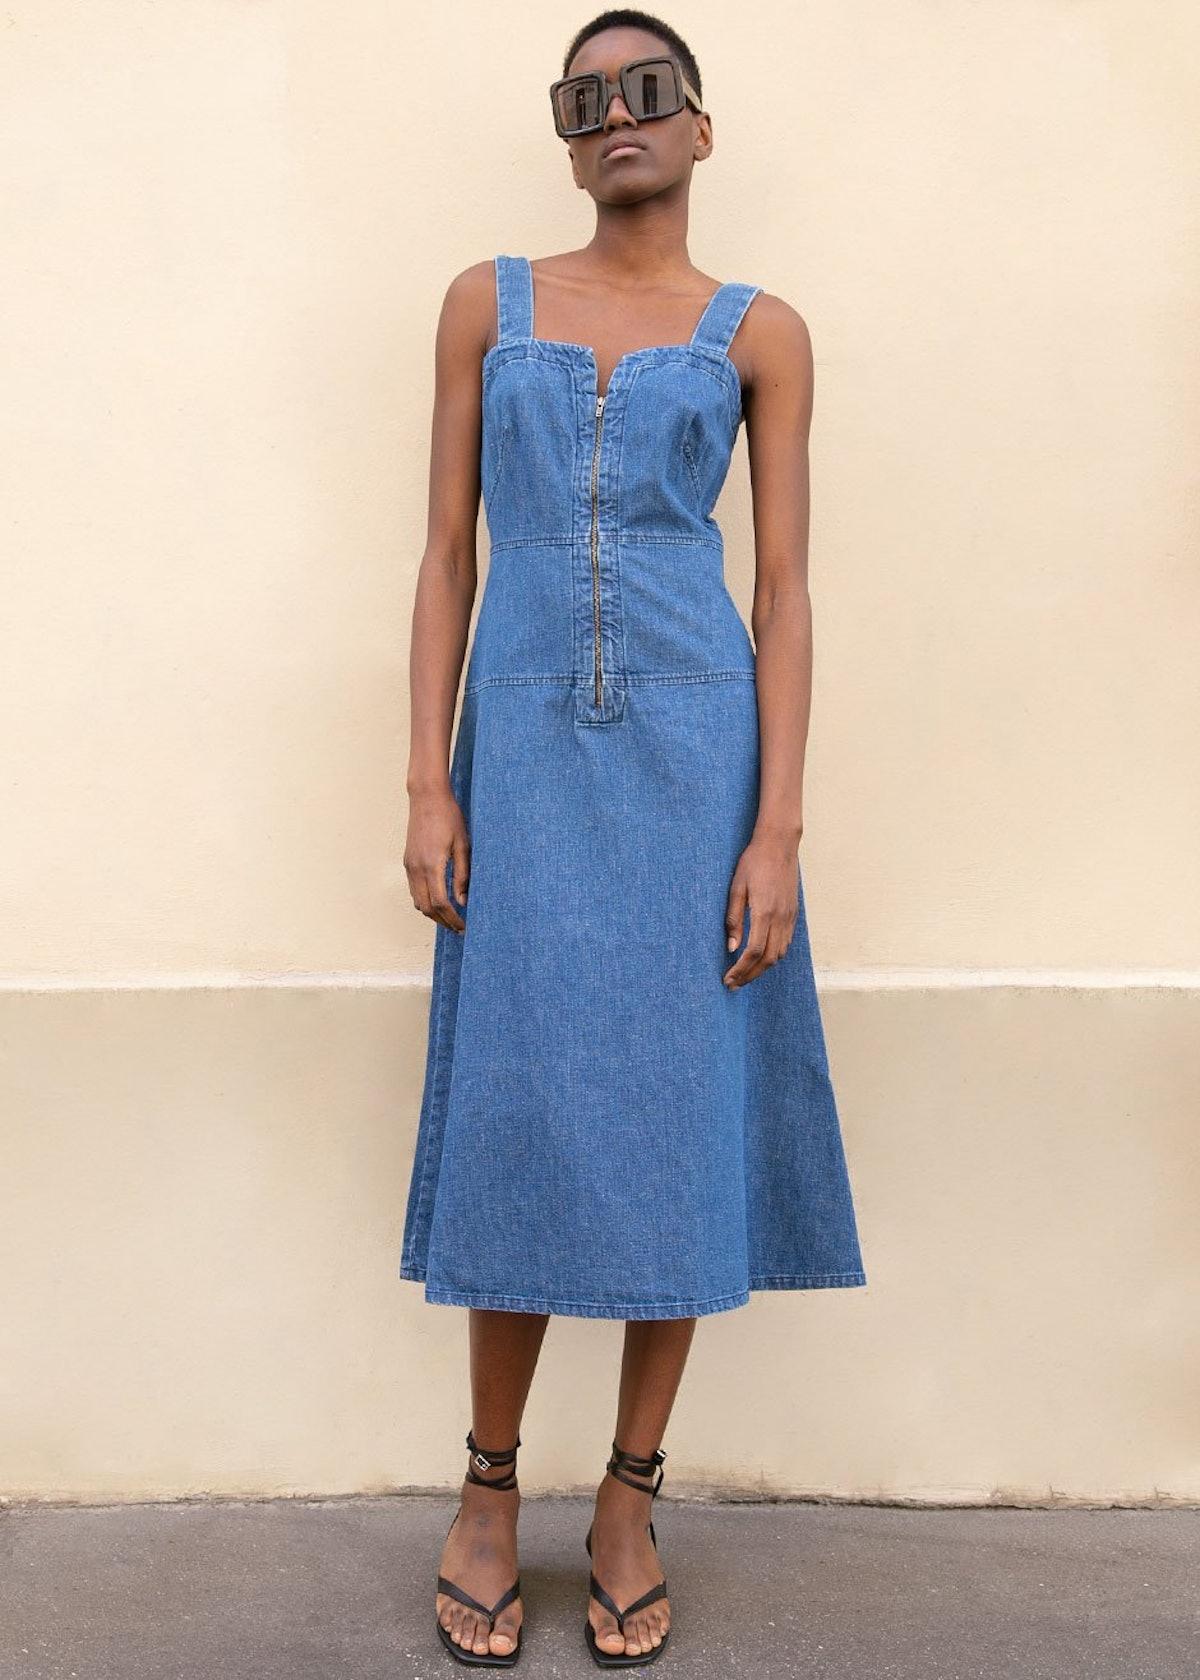 Pepper Dress